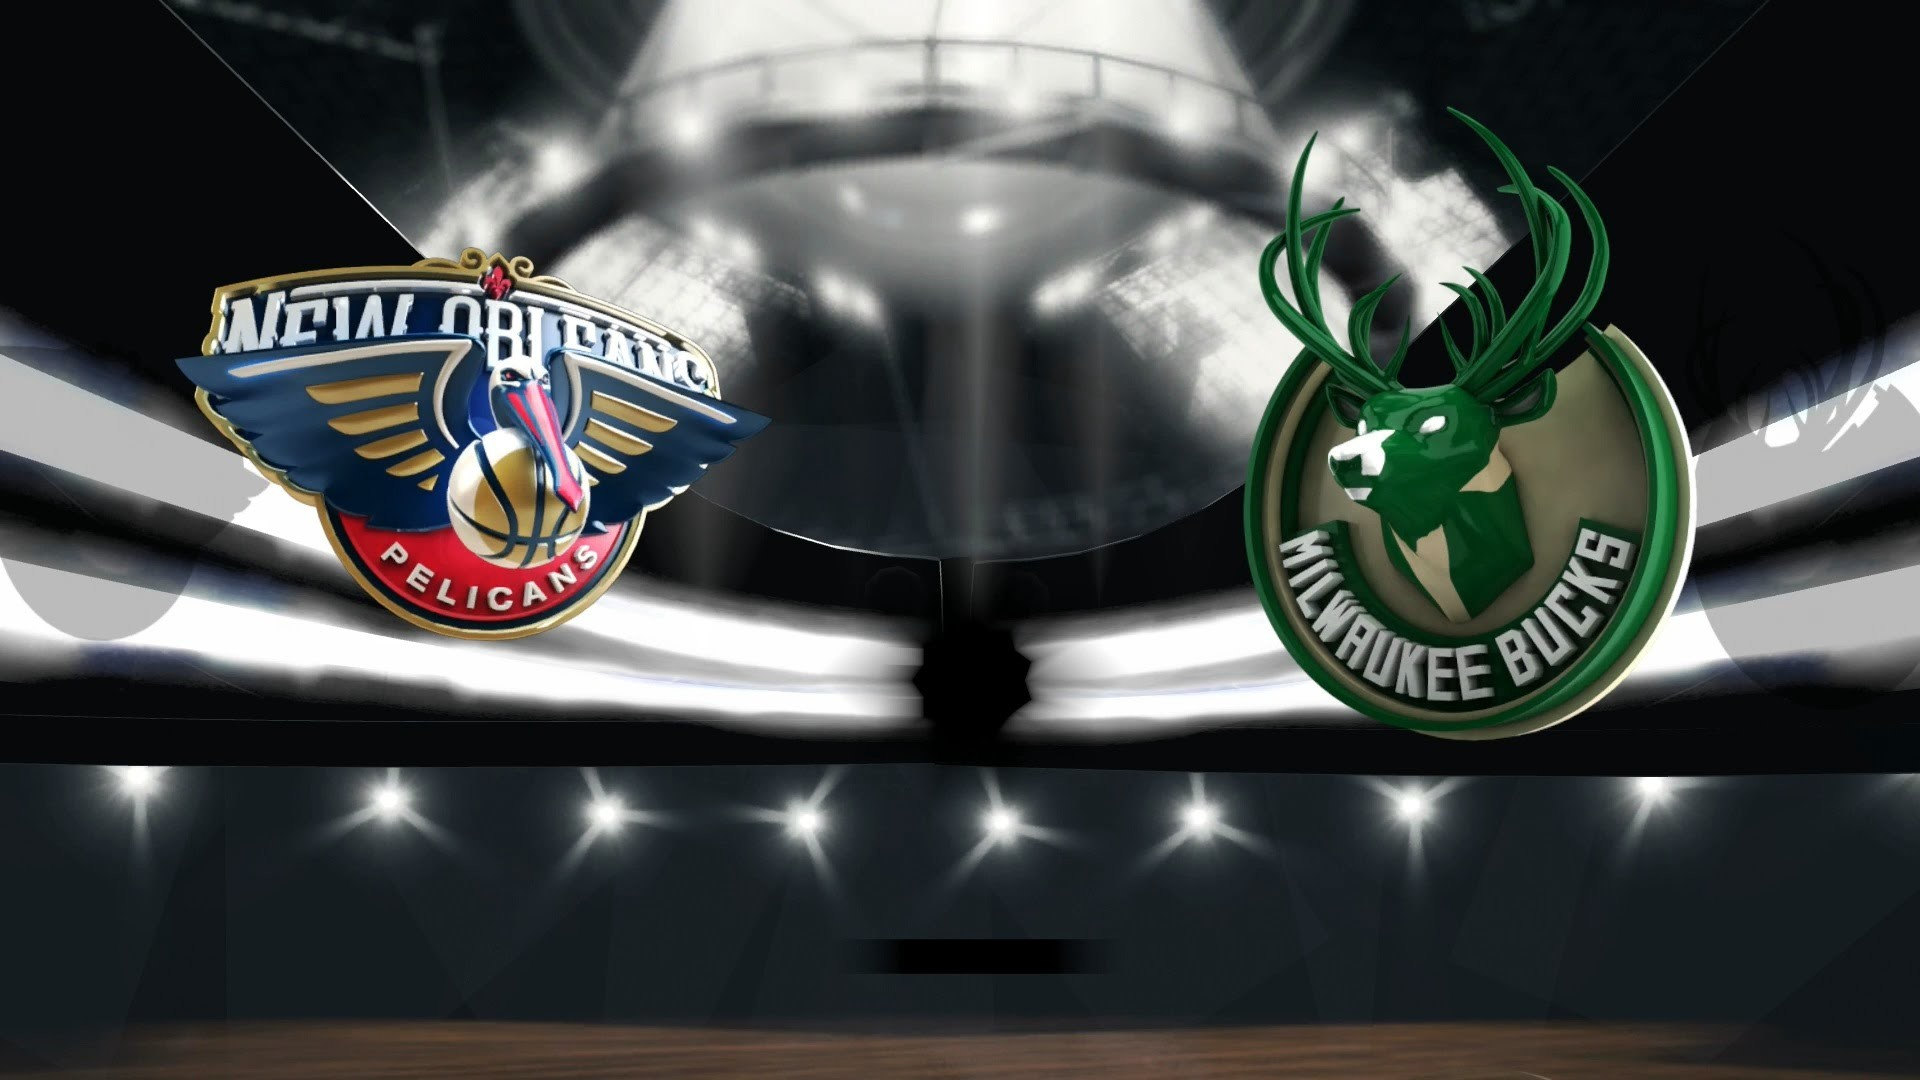 NBA 2K17 Gameplay – New Orleans Pelicans vs Milwaukee Bucks Full Game (PS4)